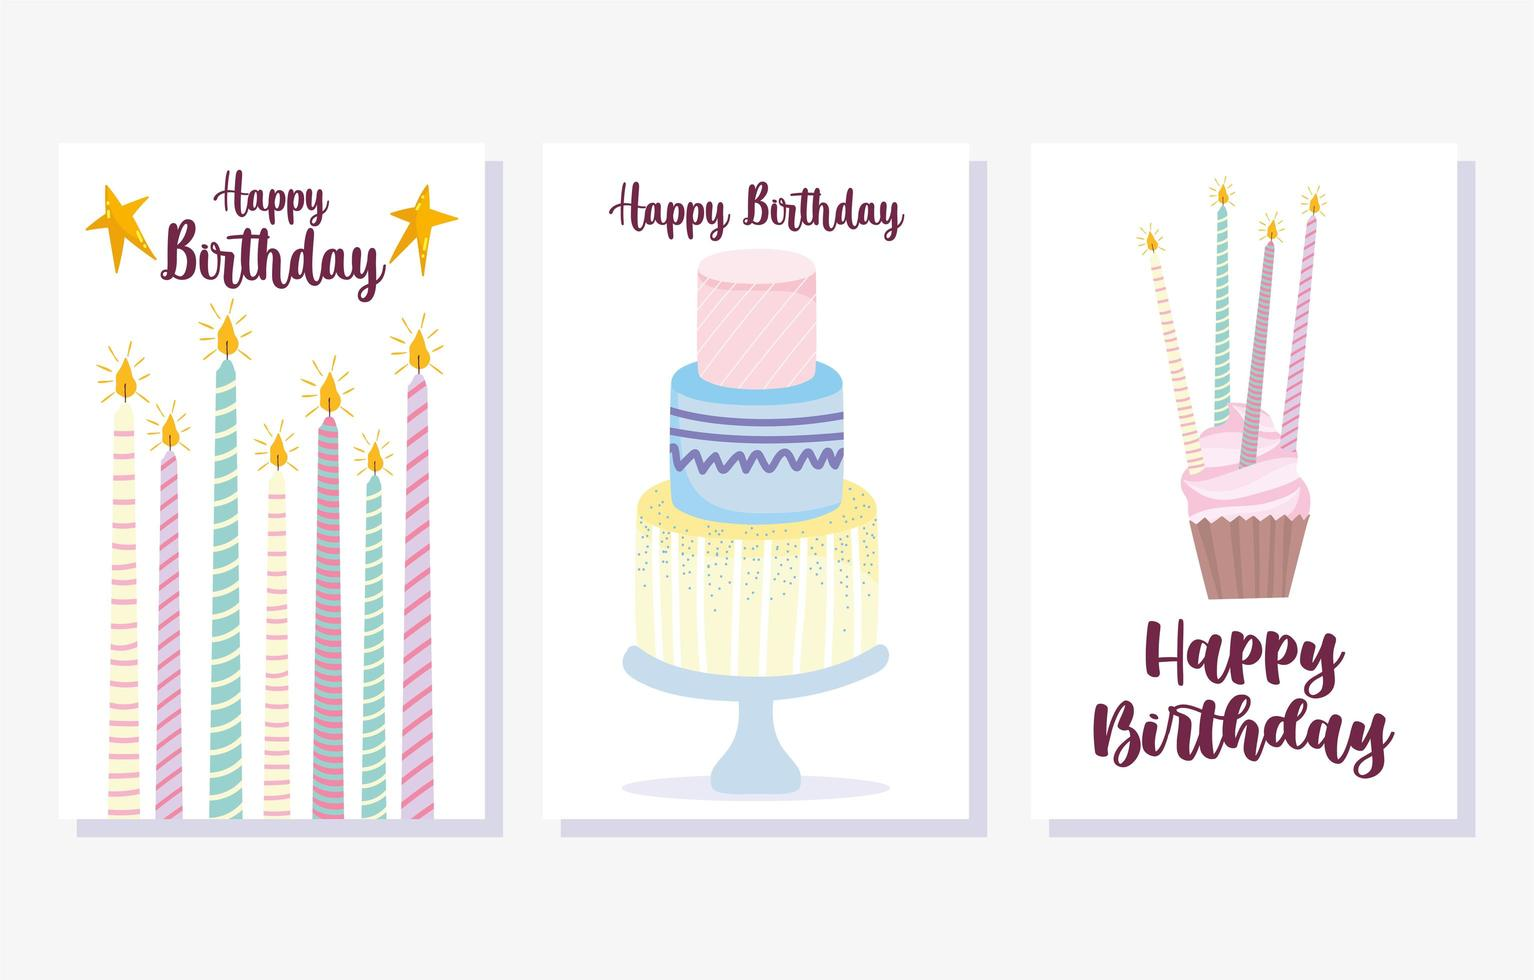 Kuchen brennende Kerzen Cupcake Kartensatz vektor